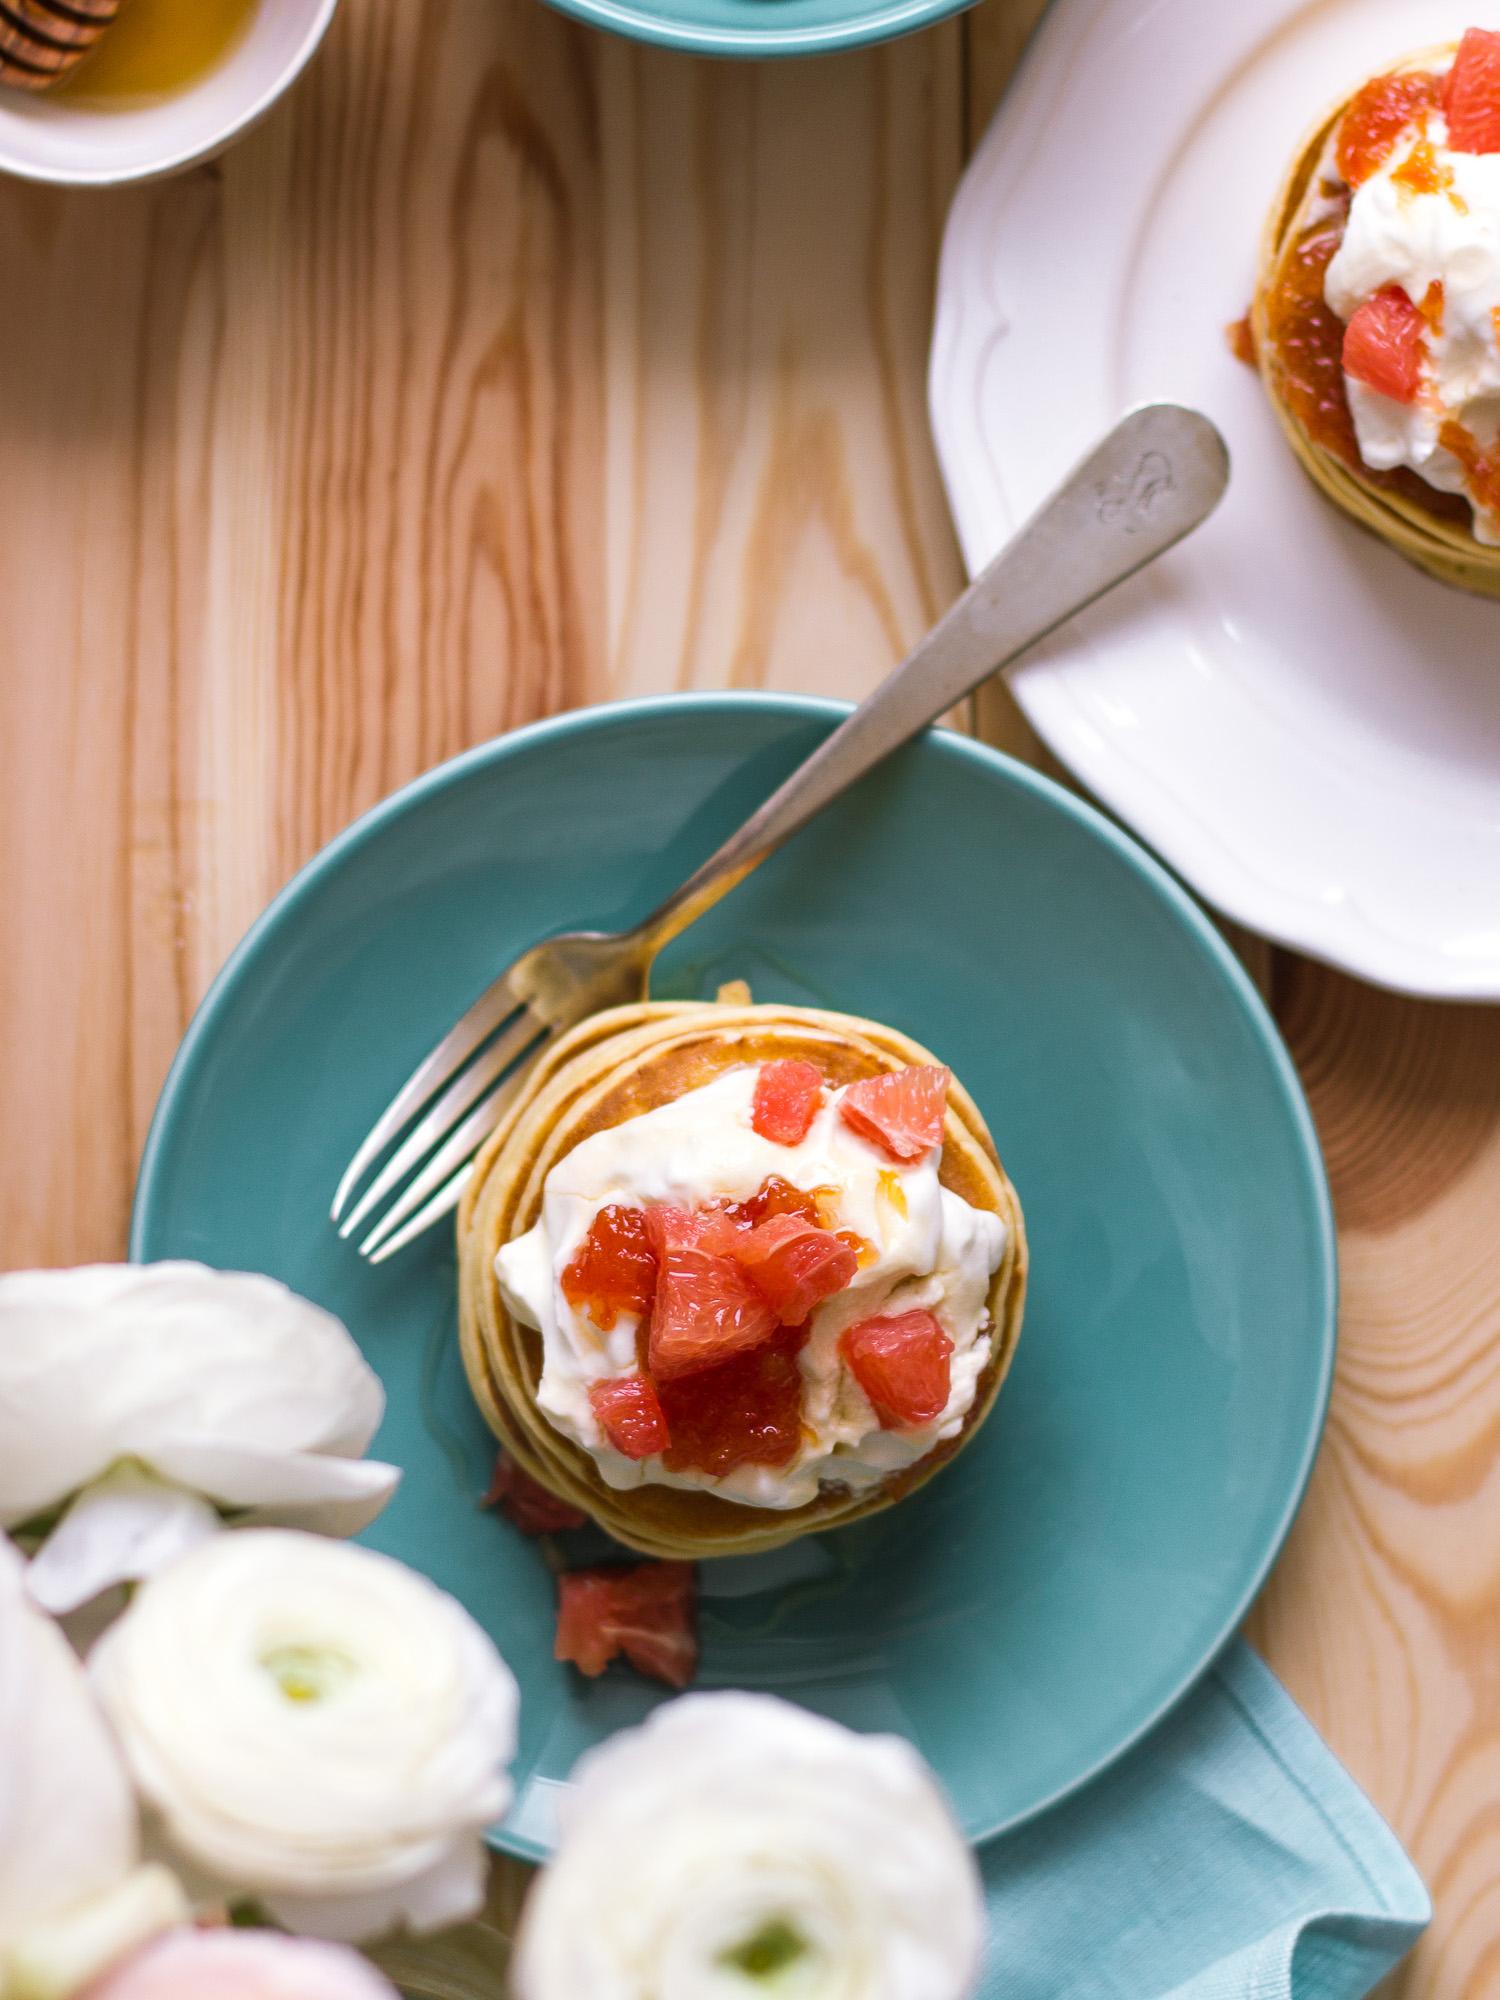 Tortitas con mermelada de pomelo